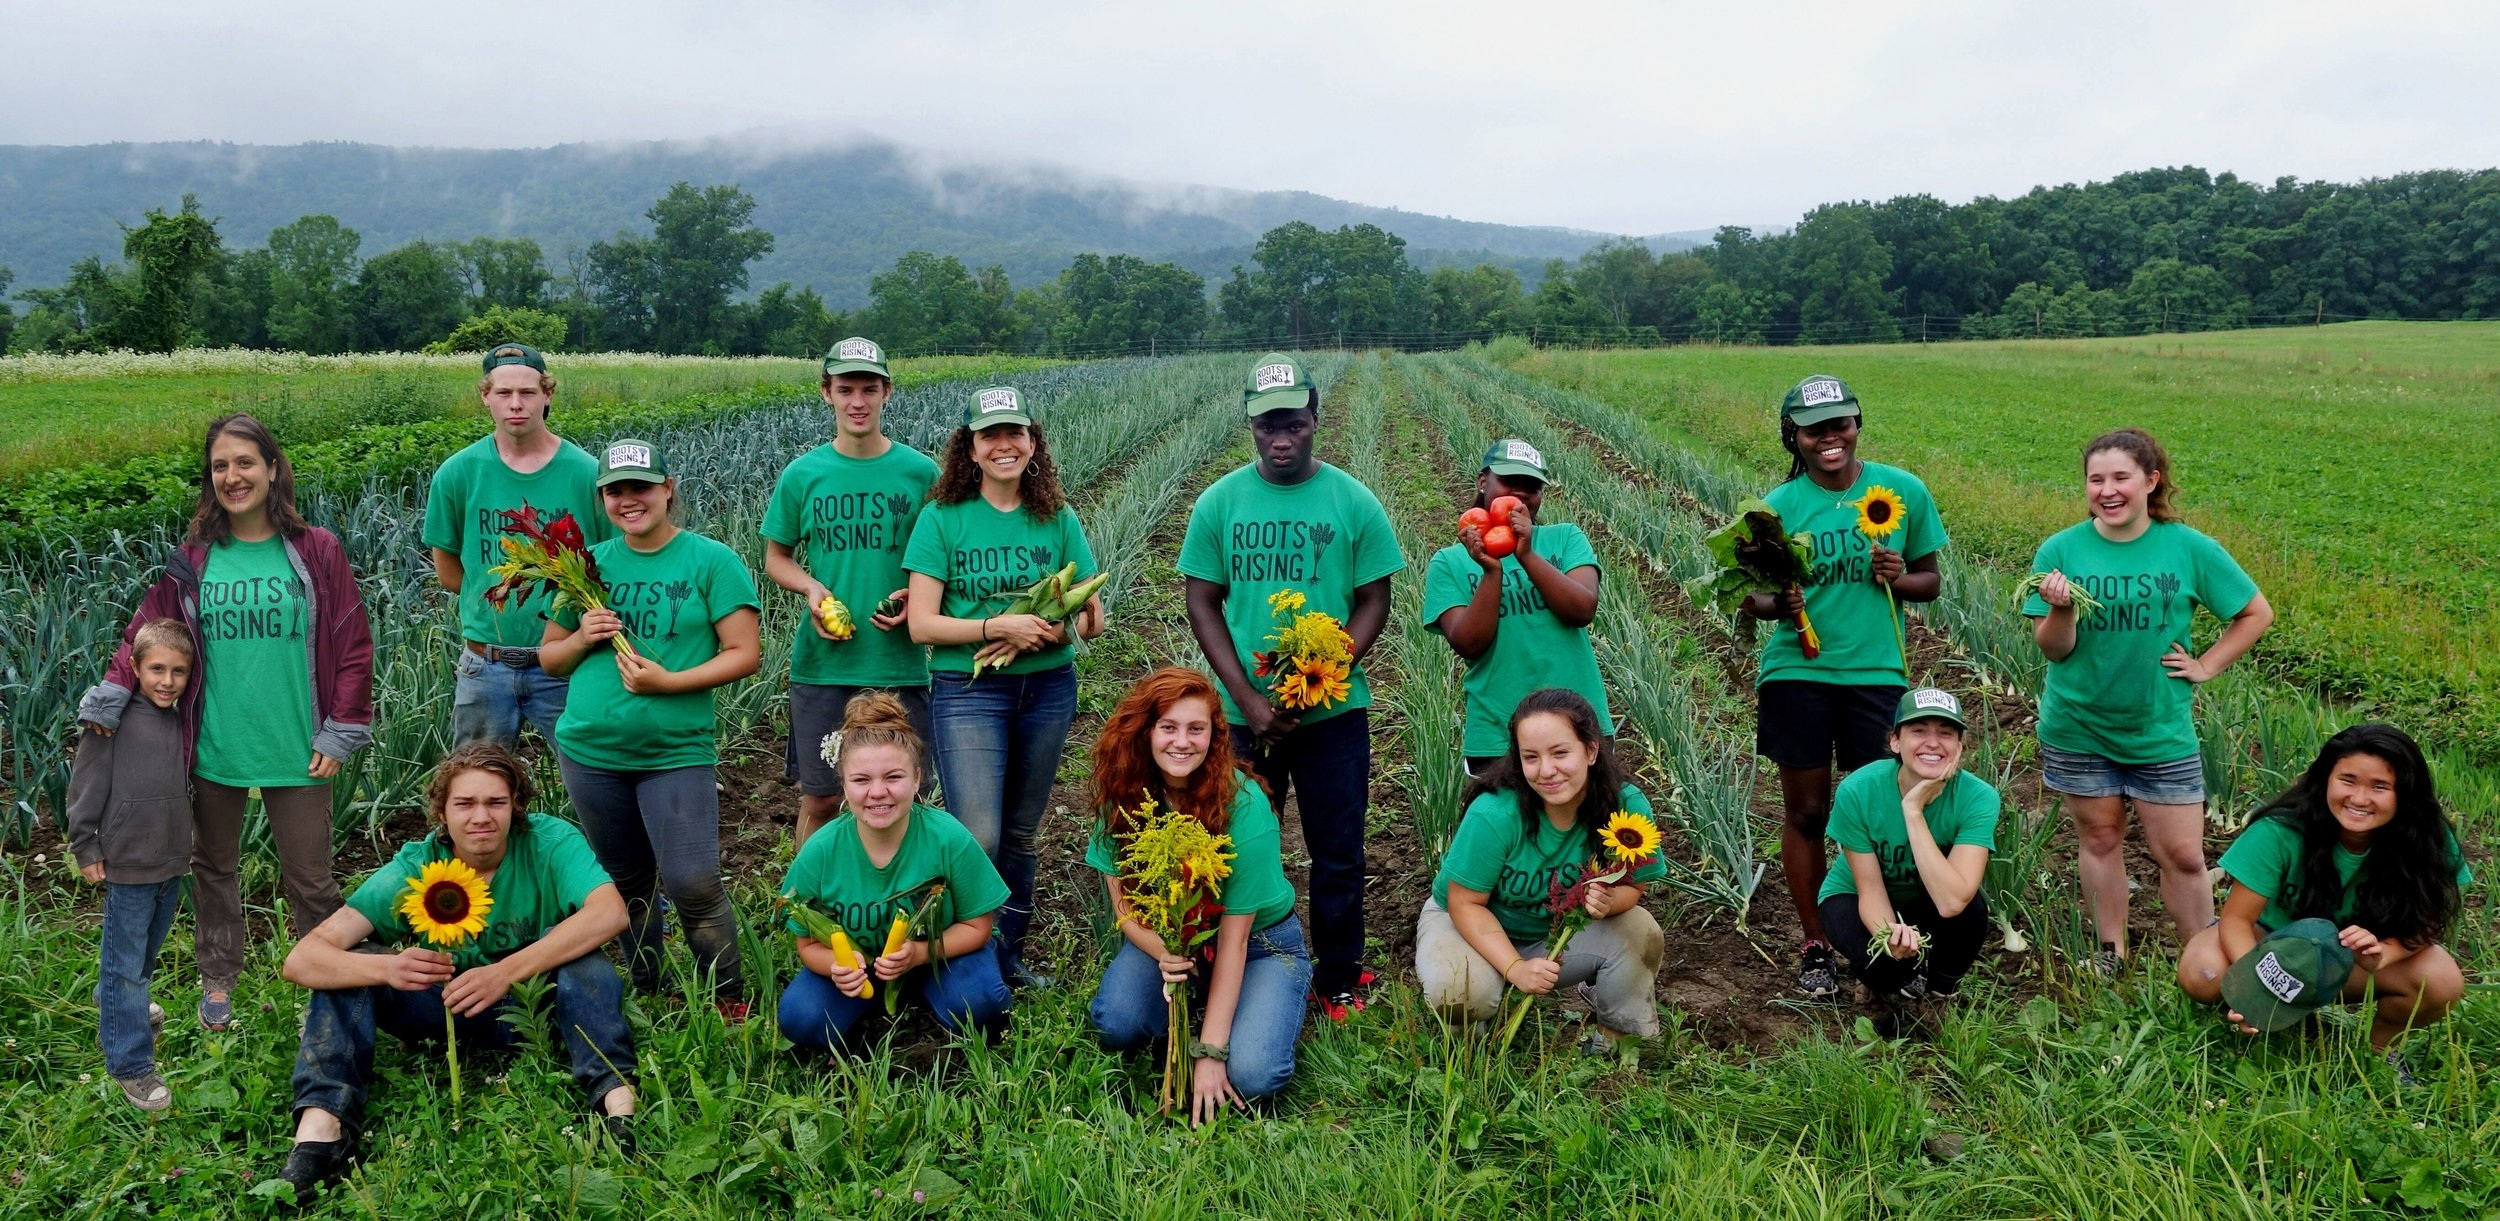 Roots Rising 2017 Farm Crew at the Darrow School field.